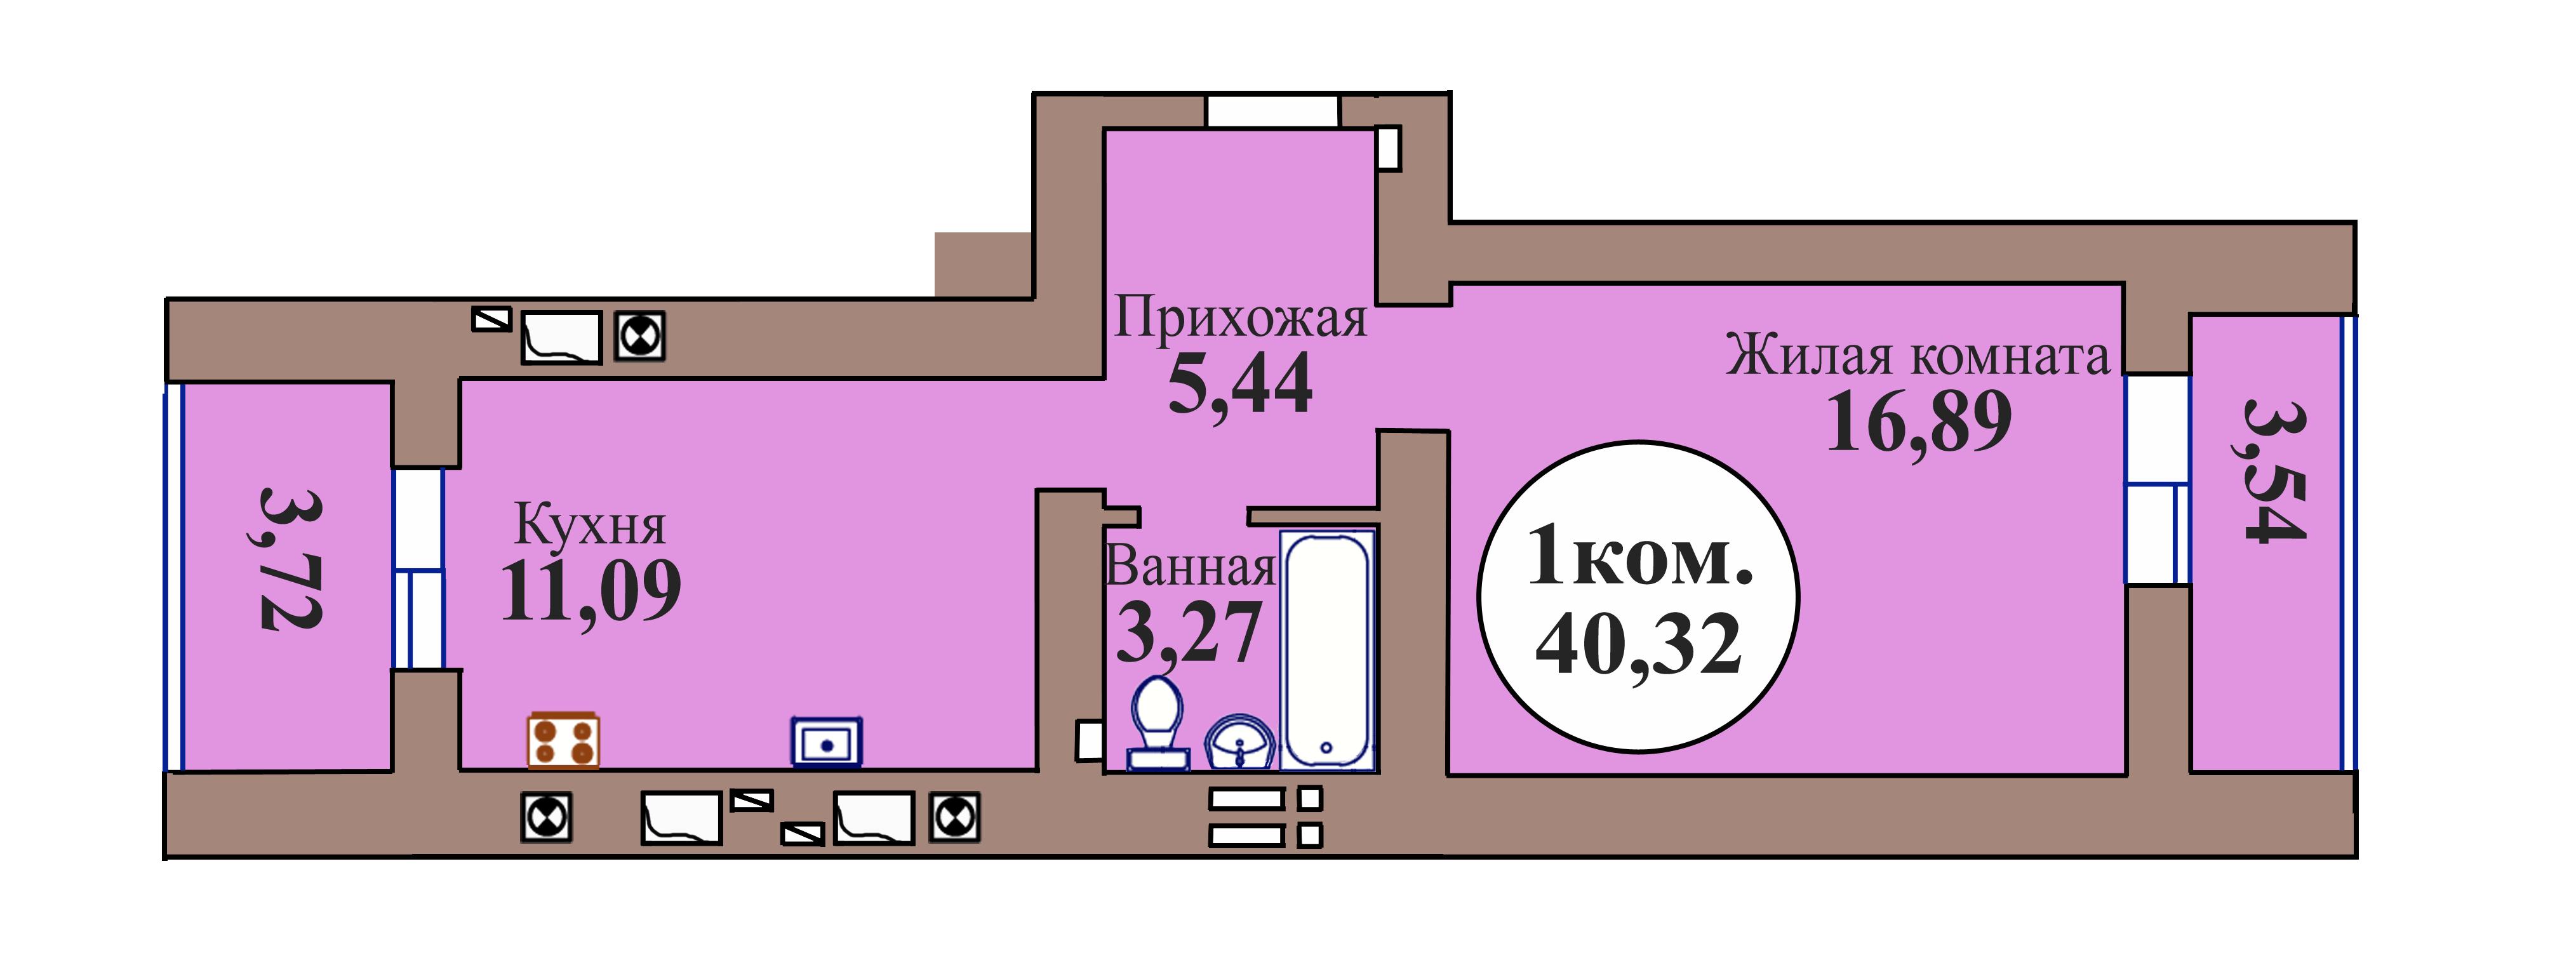 1-комн. кв. по пер. Калининградский, 5 кв. 10 в Калининграде